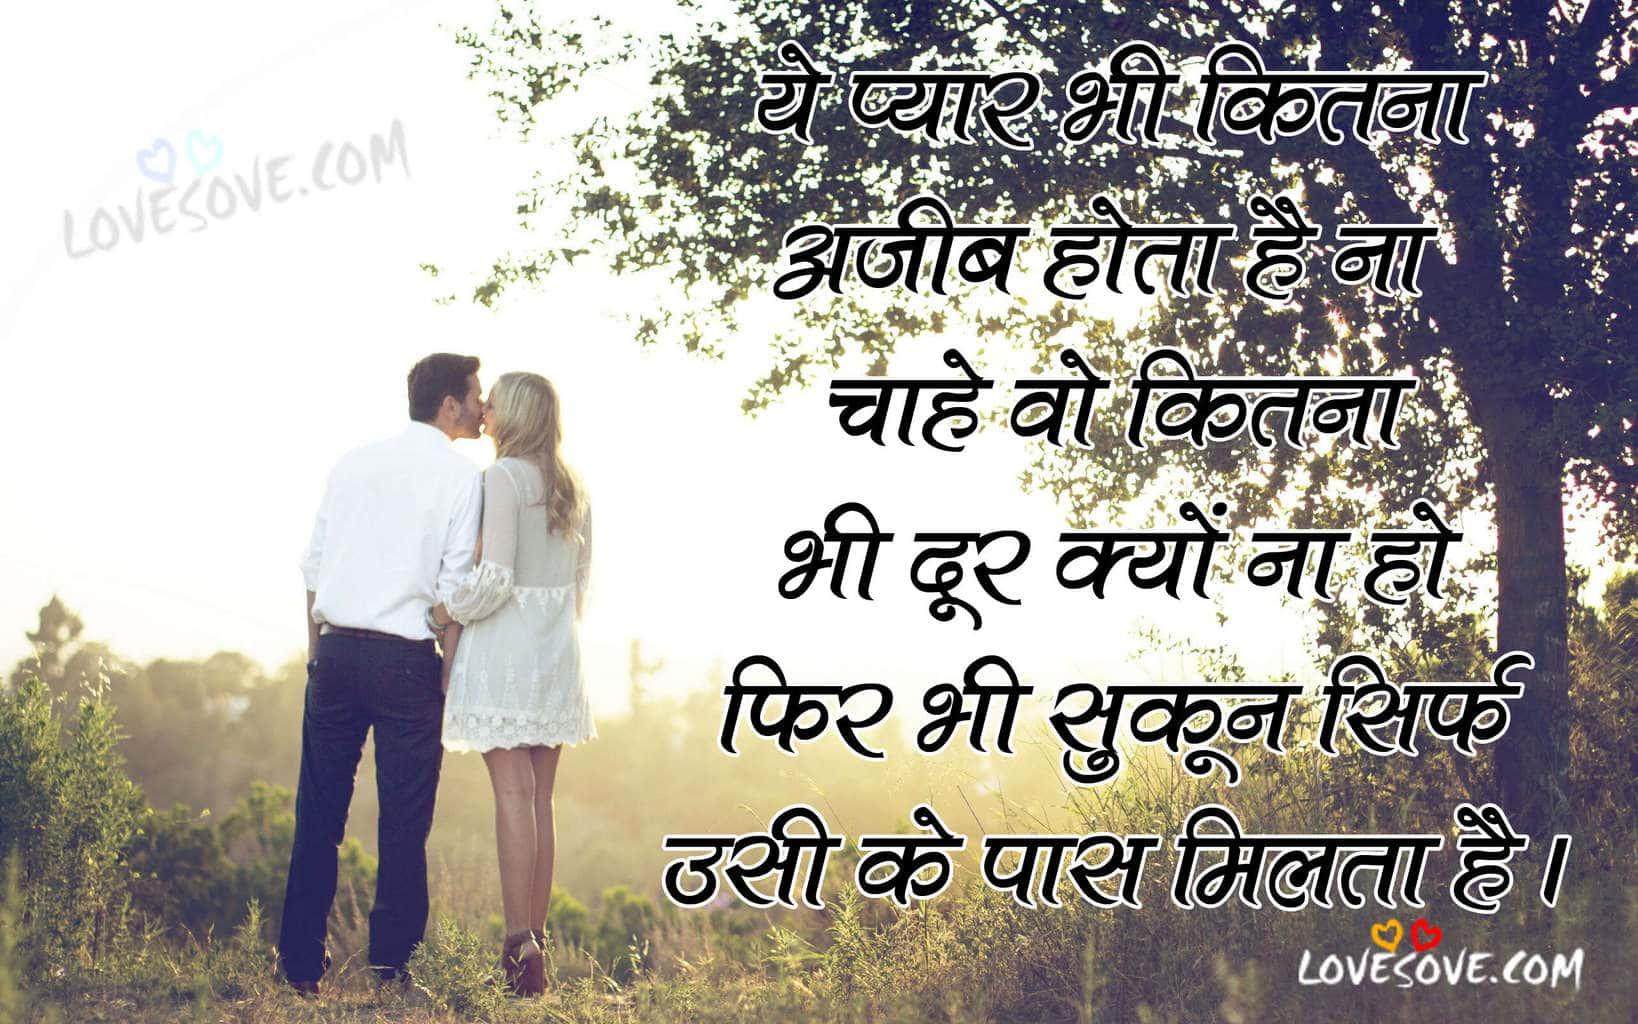 romantic 2 line shayari, romantic love quotes in hindi, love lines in hindi, best love quotes in hindi, heart touching status in hindi, heart touching lines in hindi for girlfriend, heart touching emotional friendship shayari, heart touching romantic shayari, heart touching nice love shayari, heart touching love shayari in hindi, 2 line heart touching shayari, best romantic shayari, hindi romantic shayari, latest romantic shayari, hindi love shayari, hindi quotes about love and life, love quotes hindi, love lines in hindi, romantic quotes in hindi, Hindi Love lines, Love Romantic Shayari, Hindi Quotes On Love